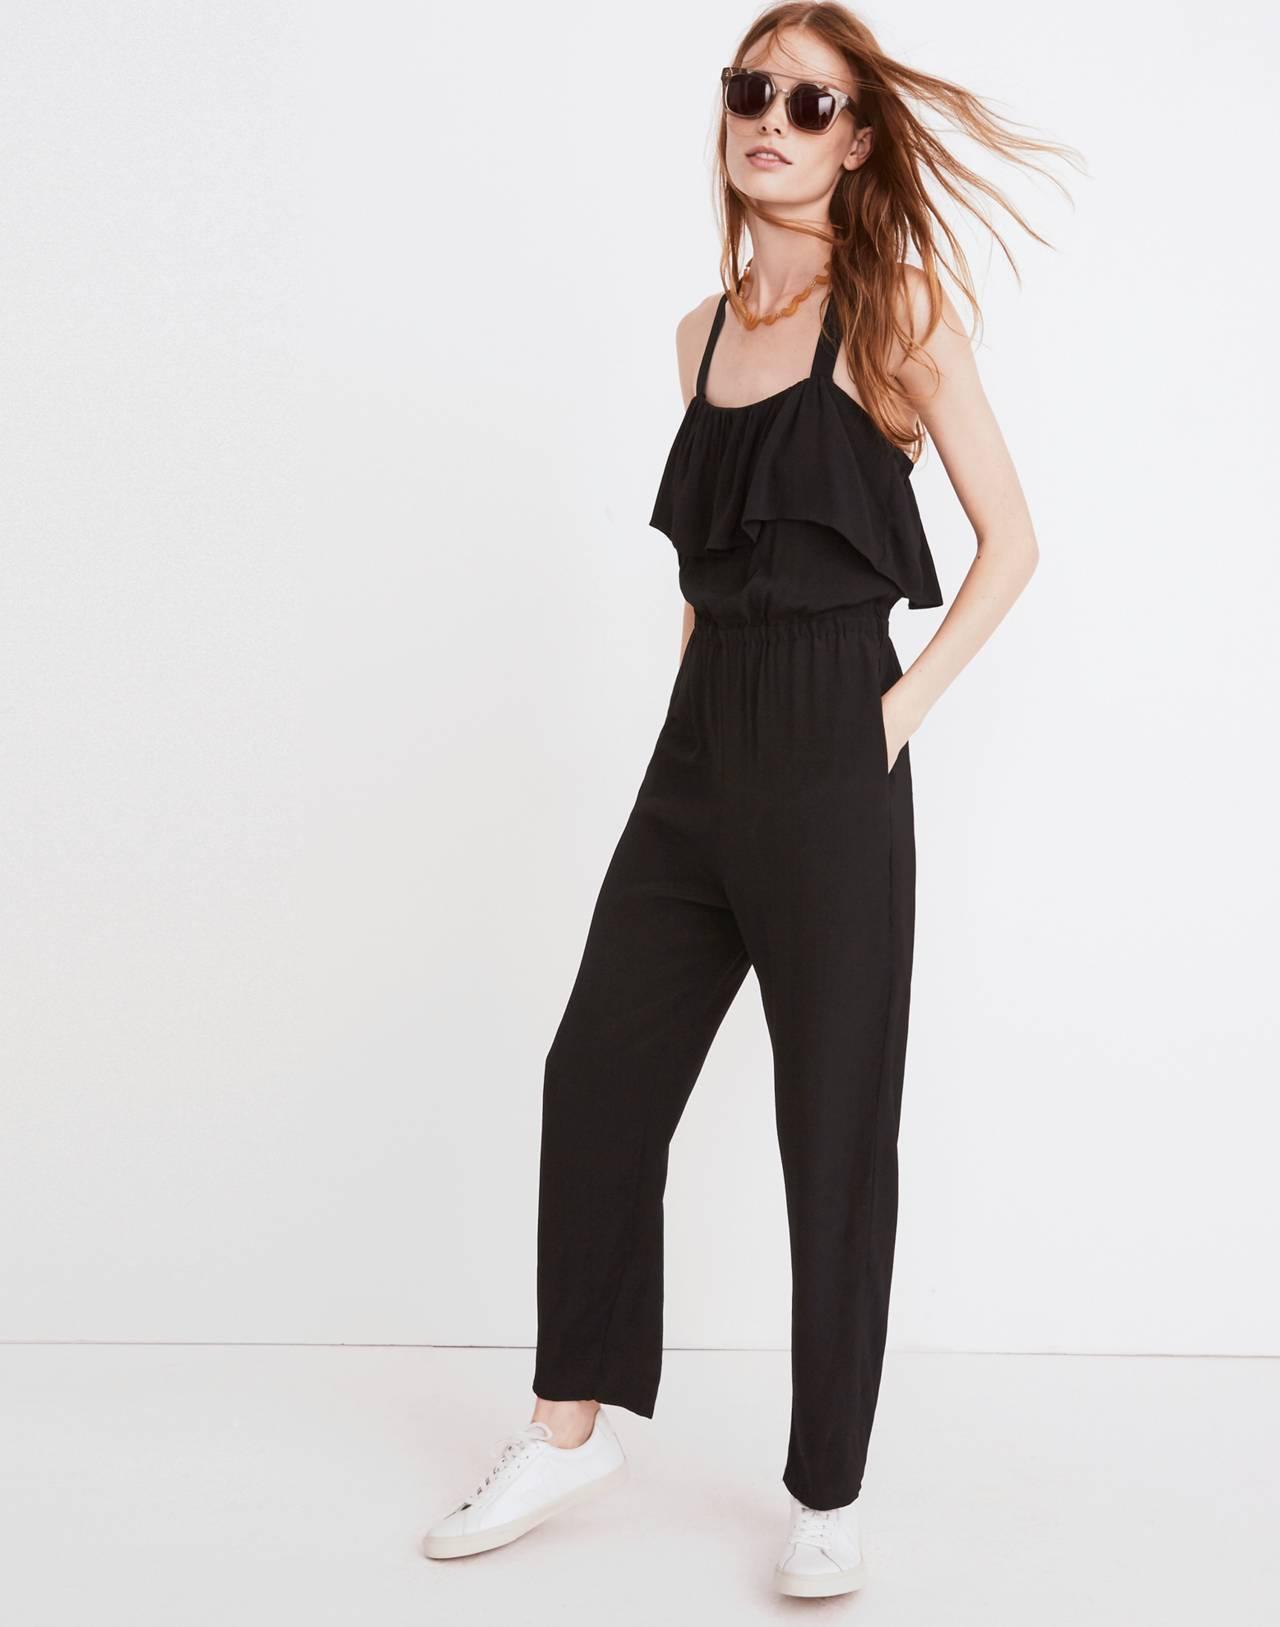 Apron Ruffle Jumpsuit in true black image 3